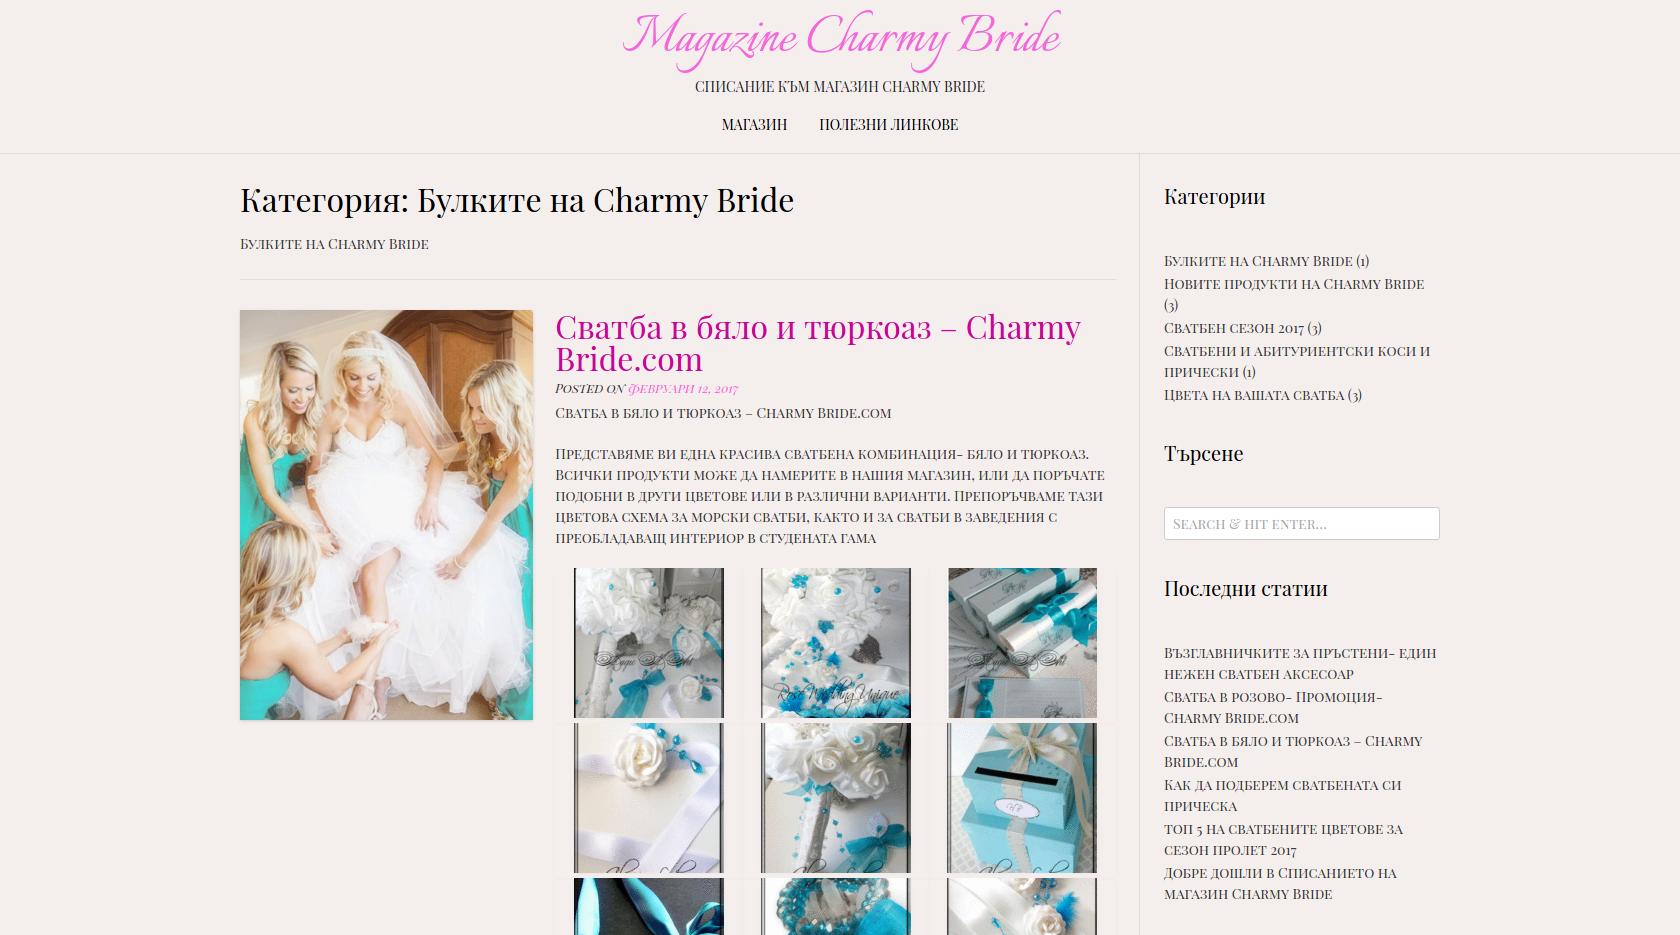 Блог magazine.charmybride.com